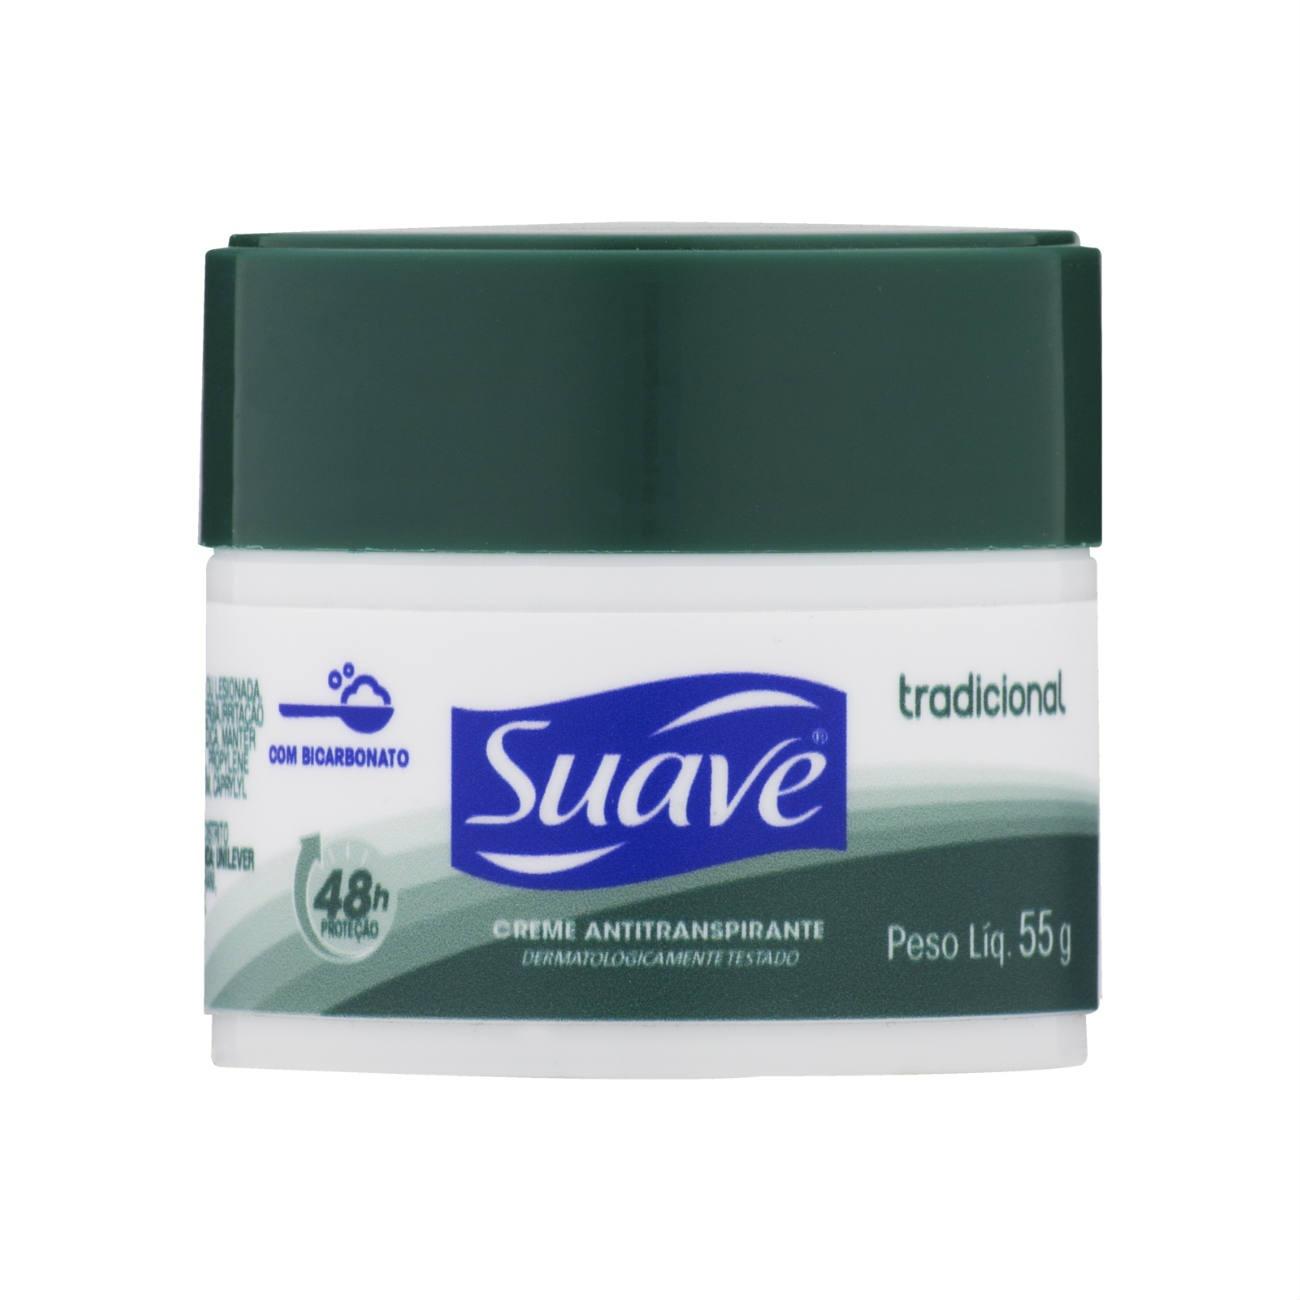 Desodorante Creme Suave Tradicional 55g